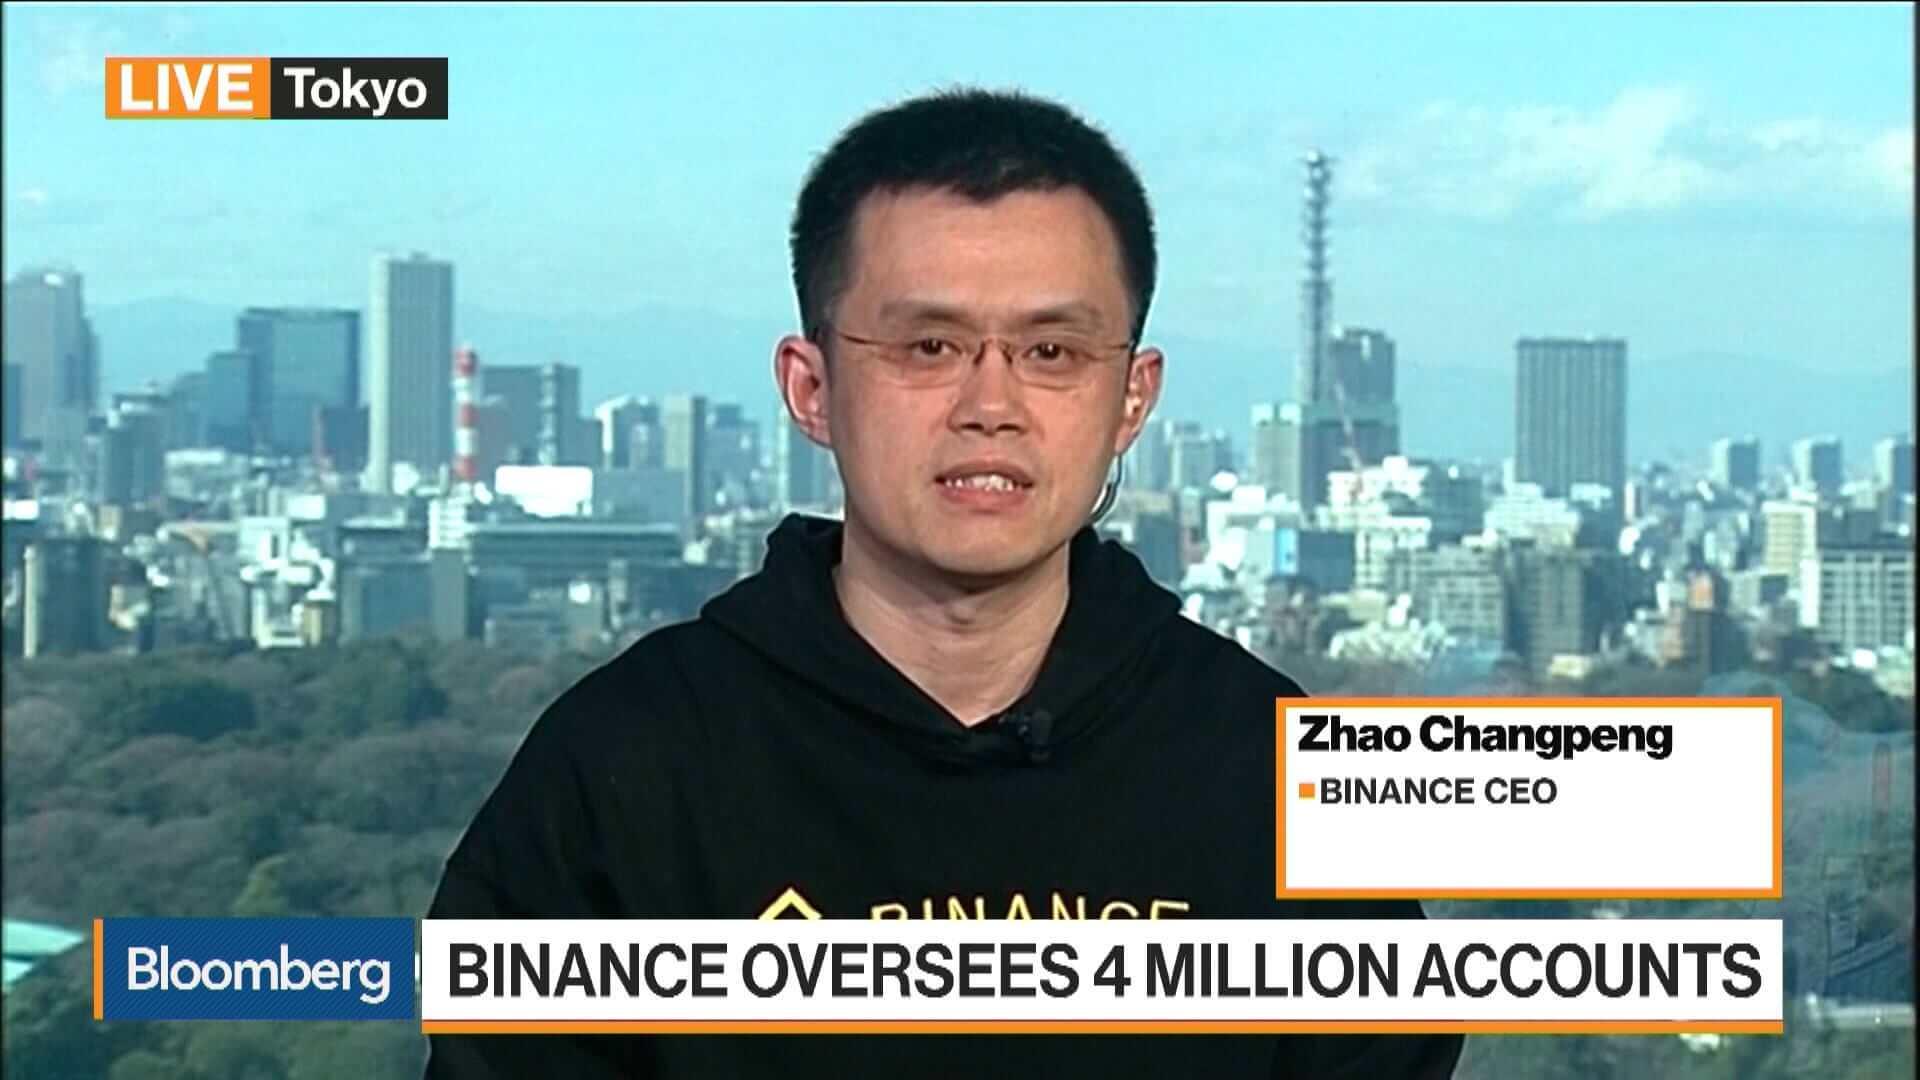 Changpeng Zhao ředitel burzy Binance